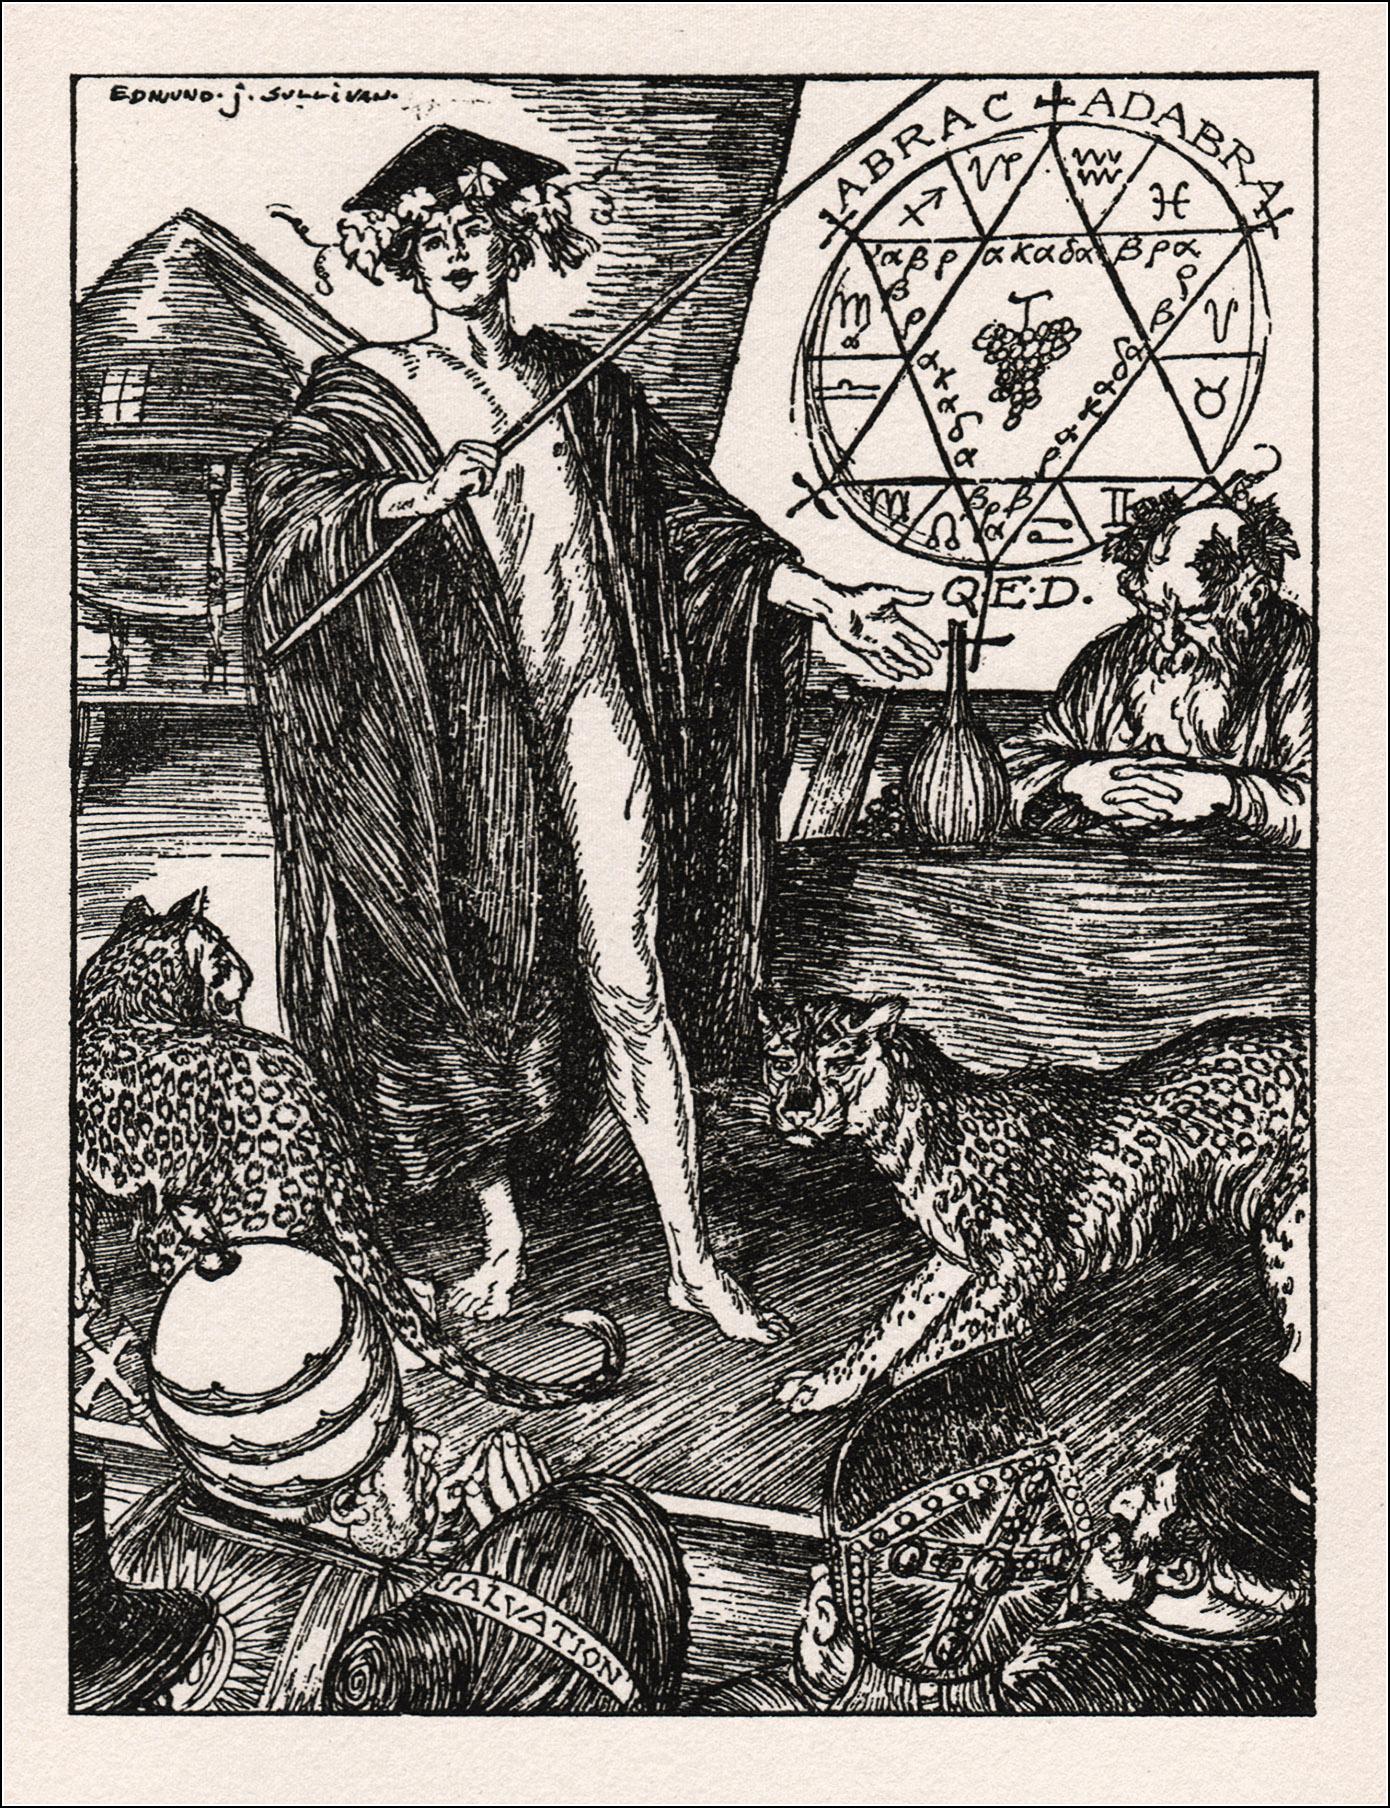 Edmund Joseph Sullivan, Rubáiyát of Omar Khayyám